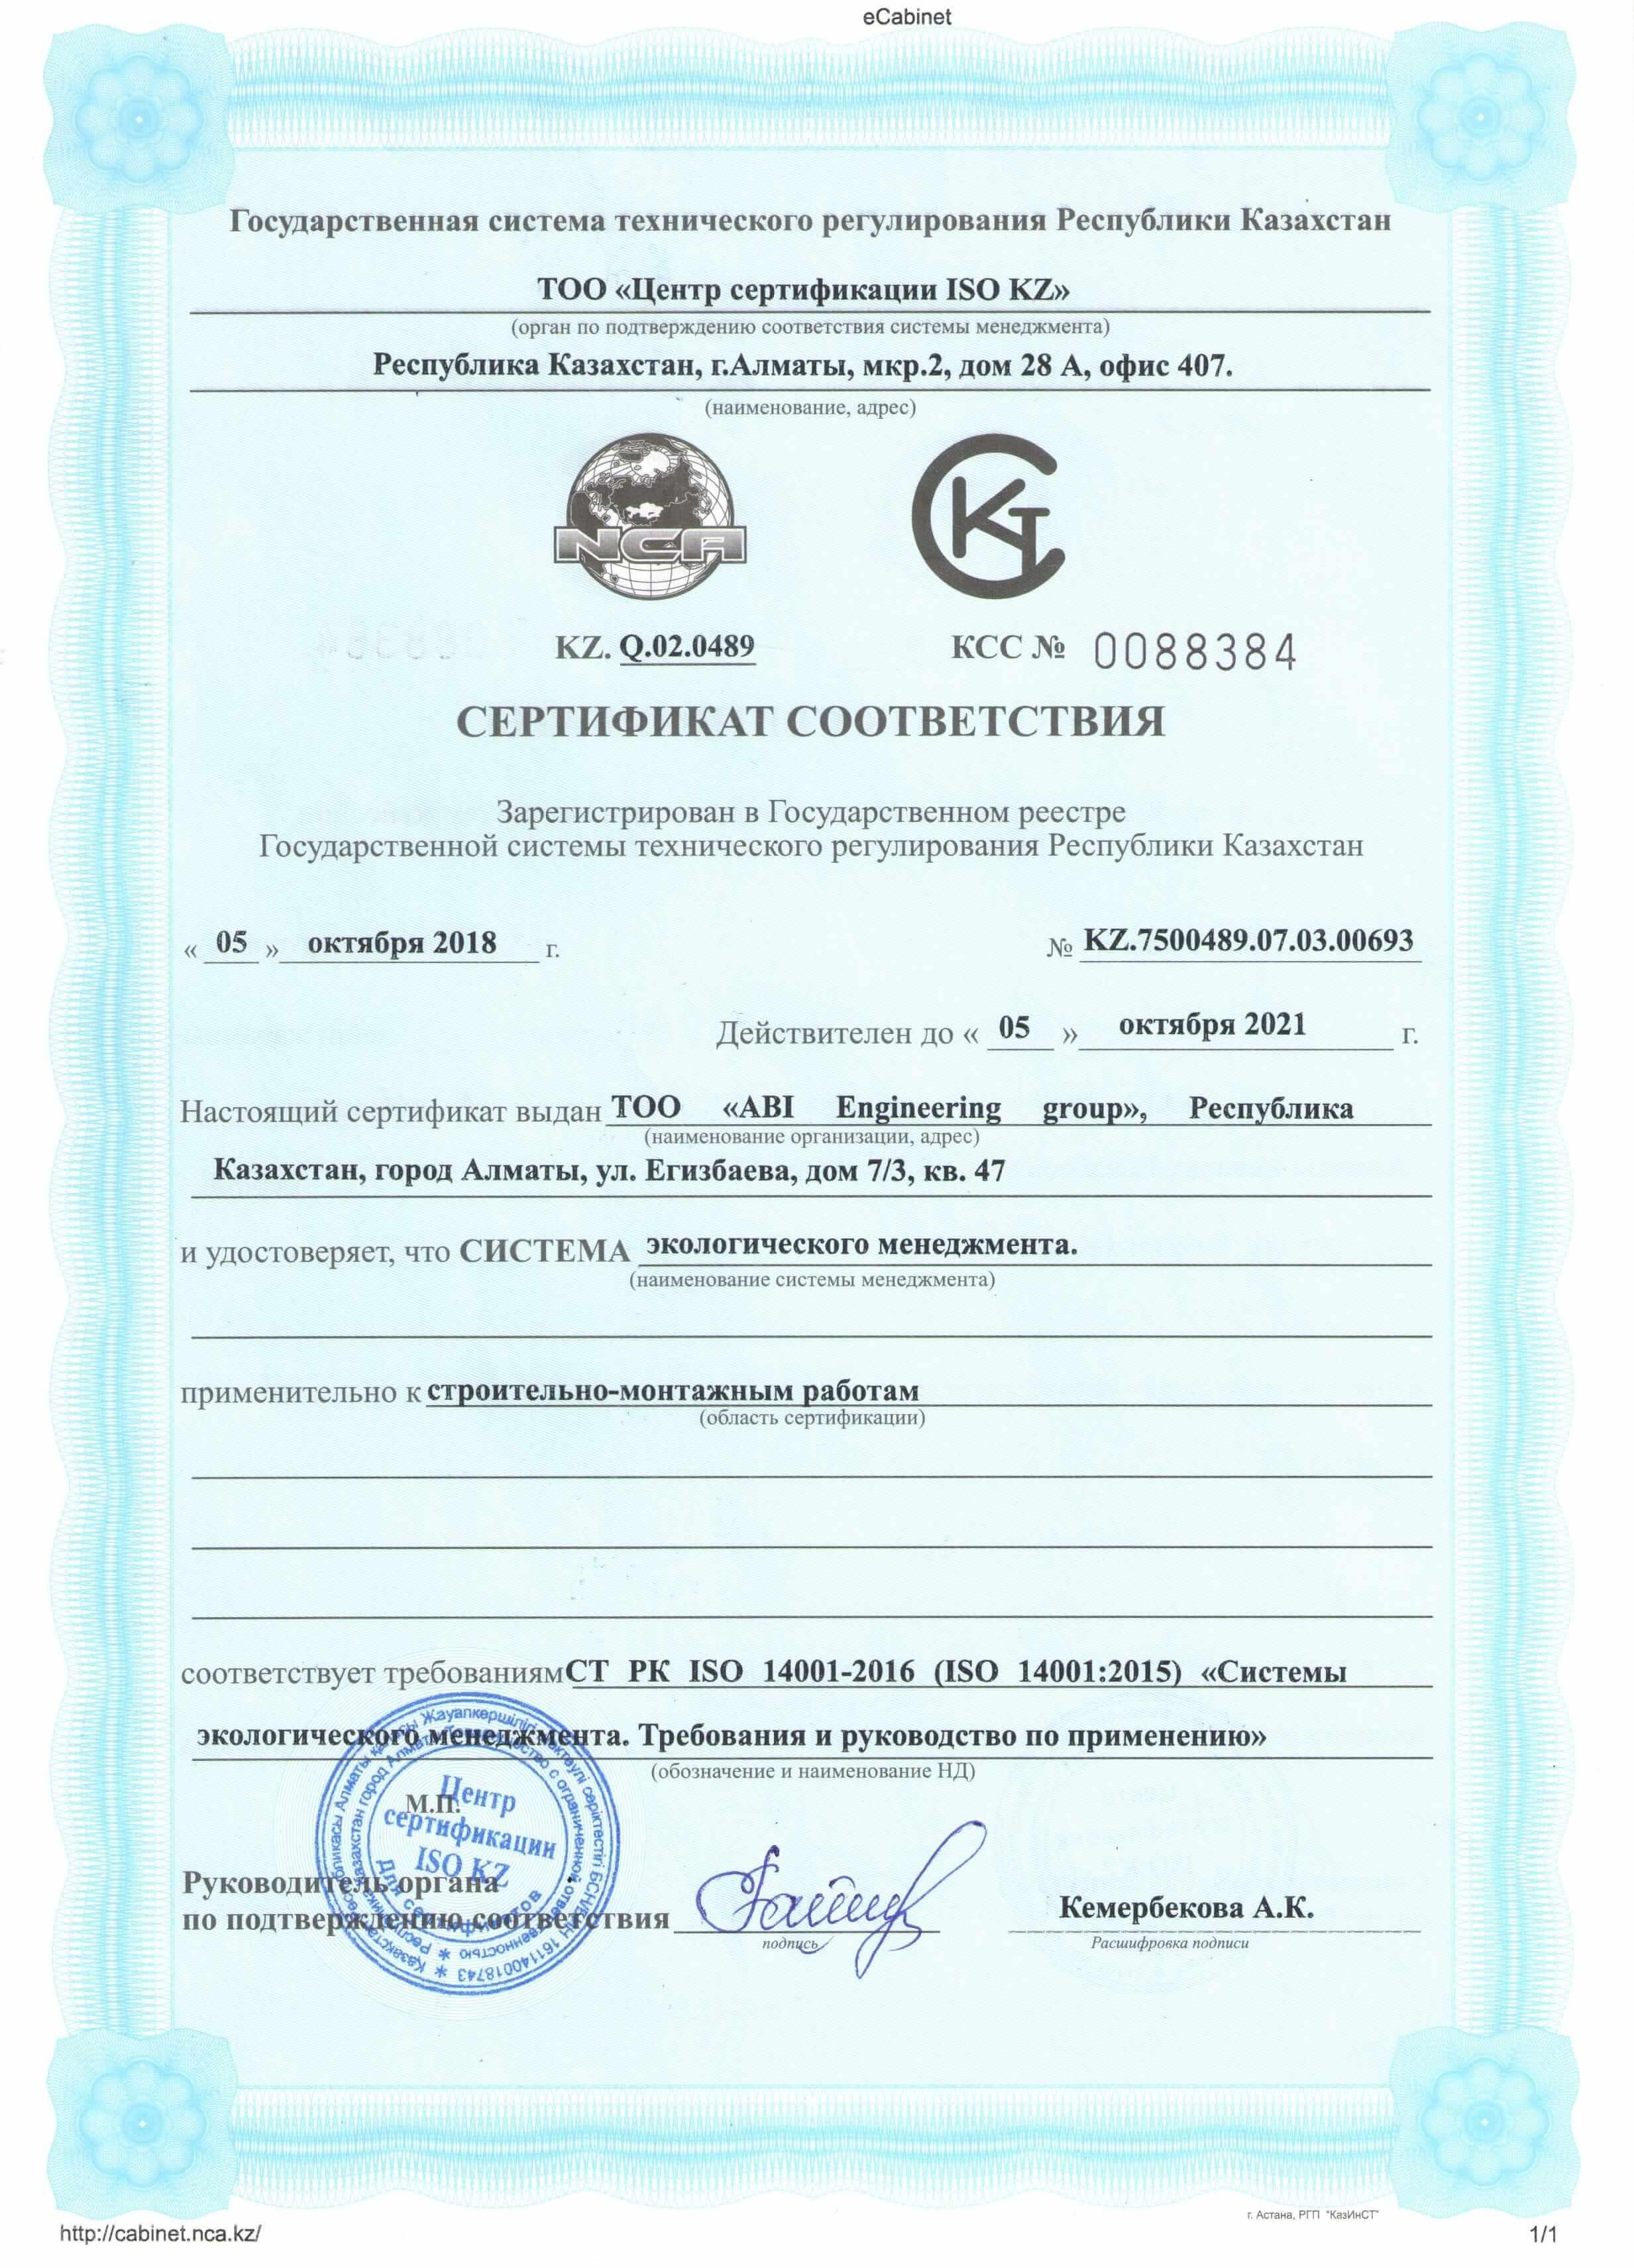 сертификат_0088384